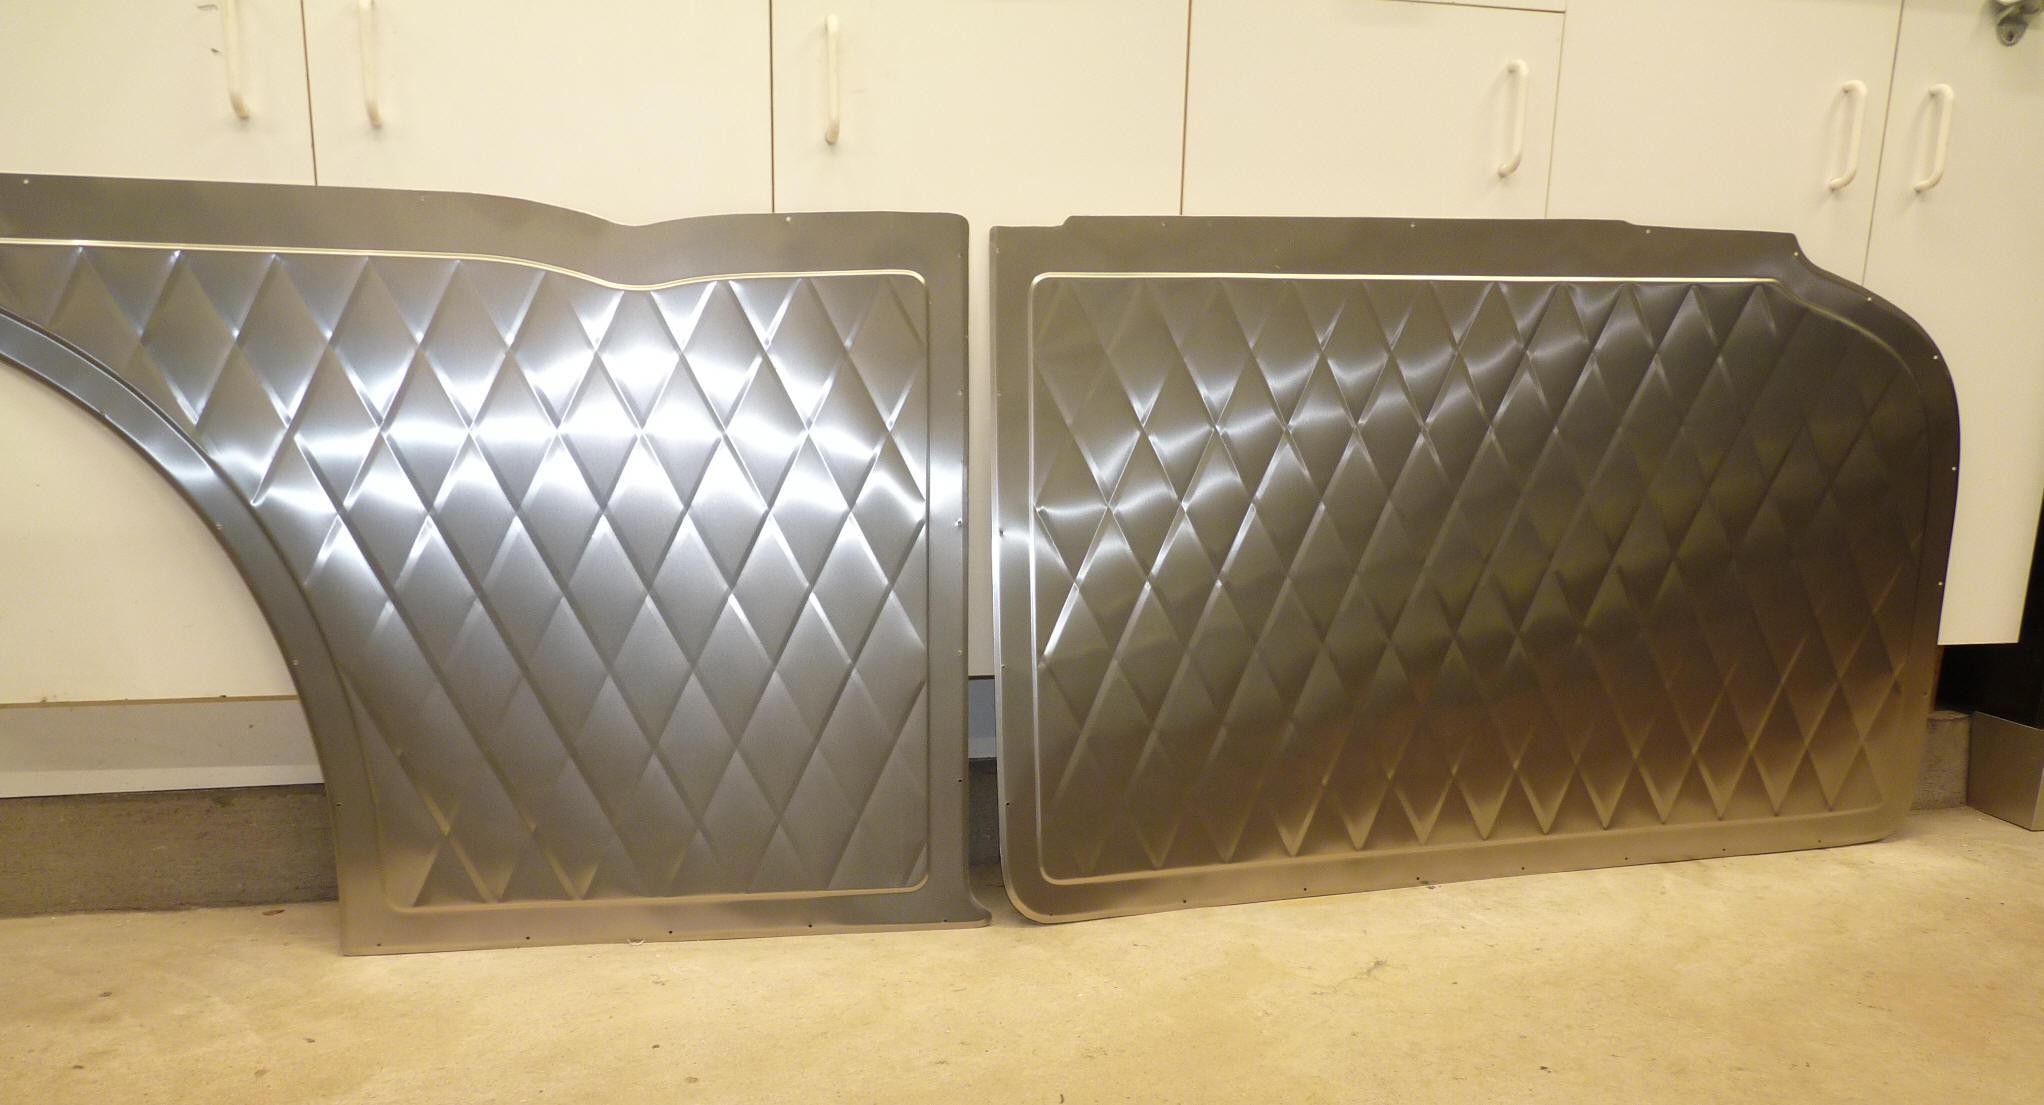 Big Wig Race Cars Aluminum Door Panels Gm Ford Mazda Opel 1966 Chevy C10 1953 57 2 Sedan Set